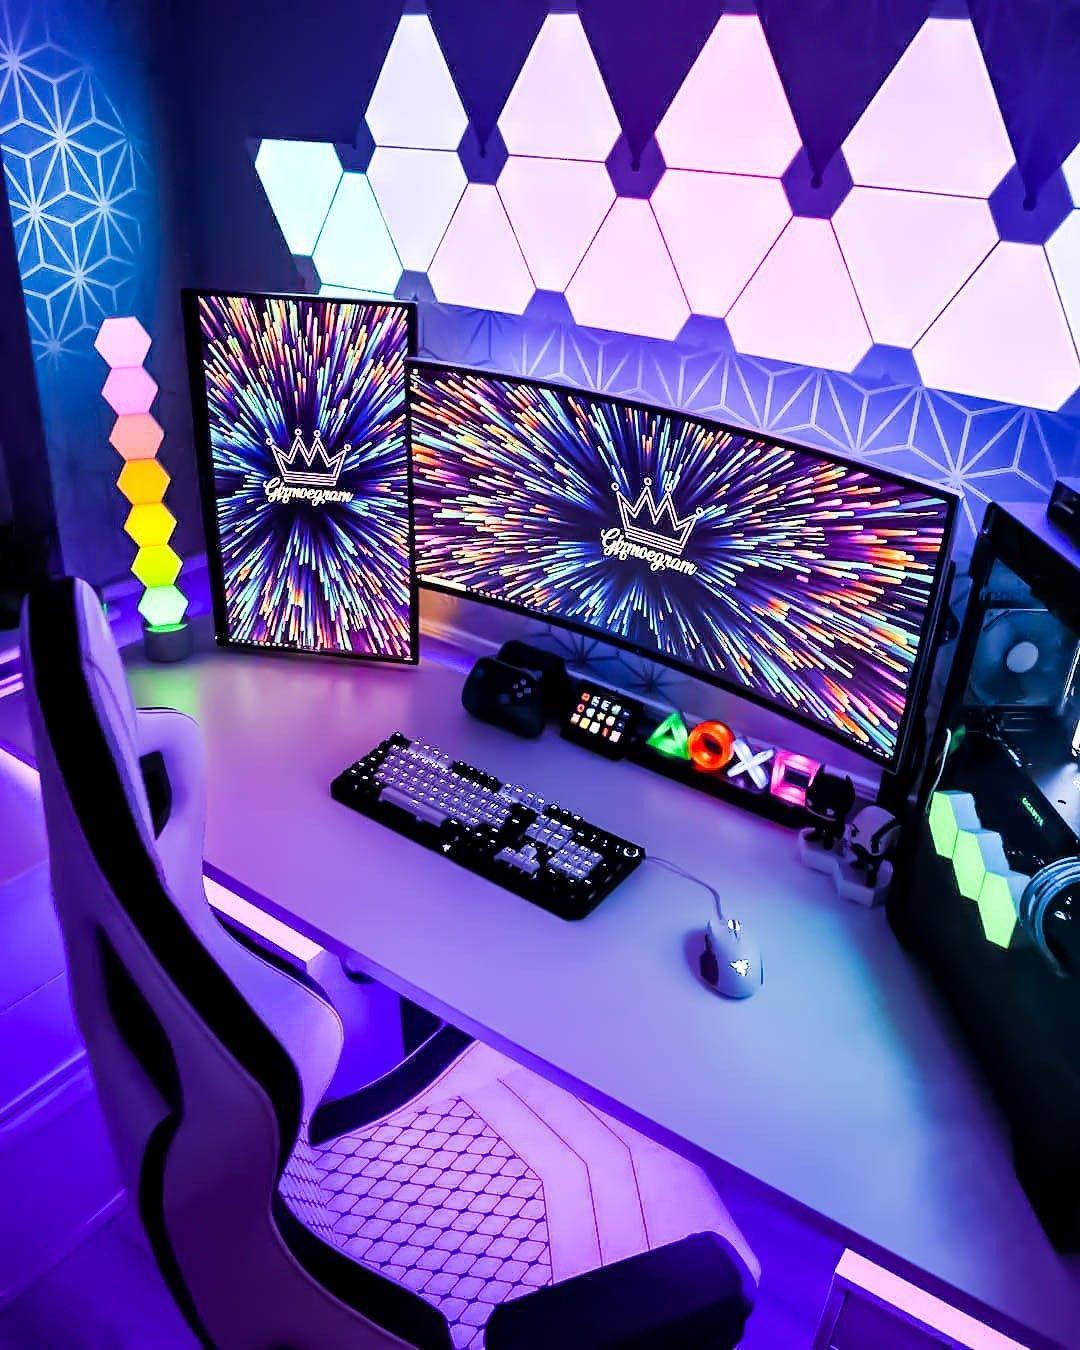 220 Gaming Room Setups Gaming Room Setup Video Game Room Design Video Game Rooms Bedroom gaming pc setup